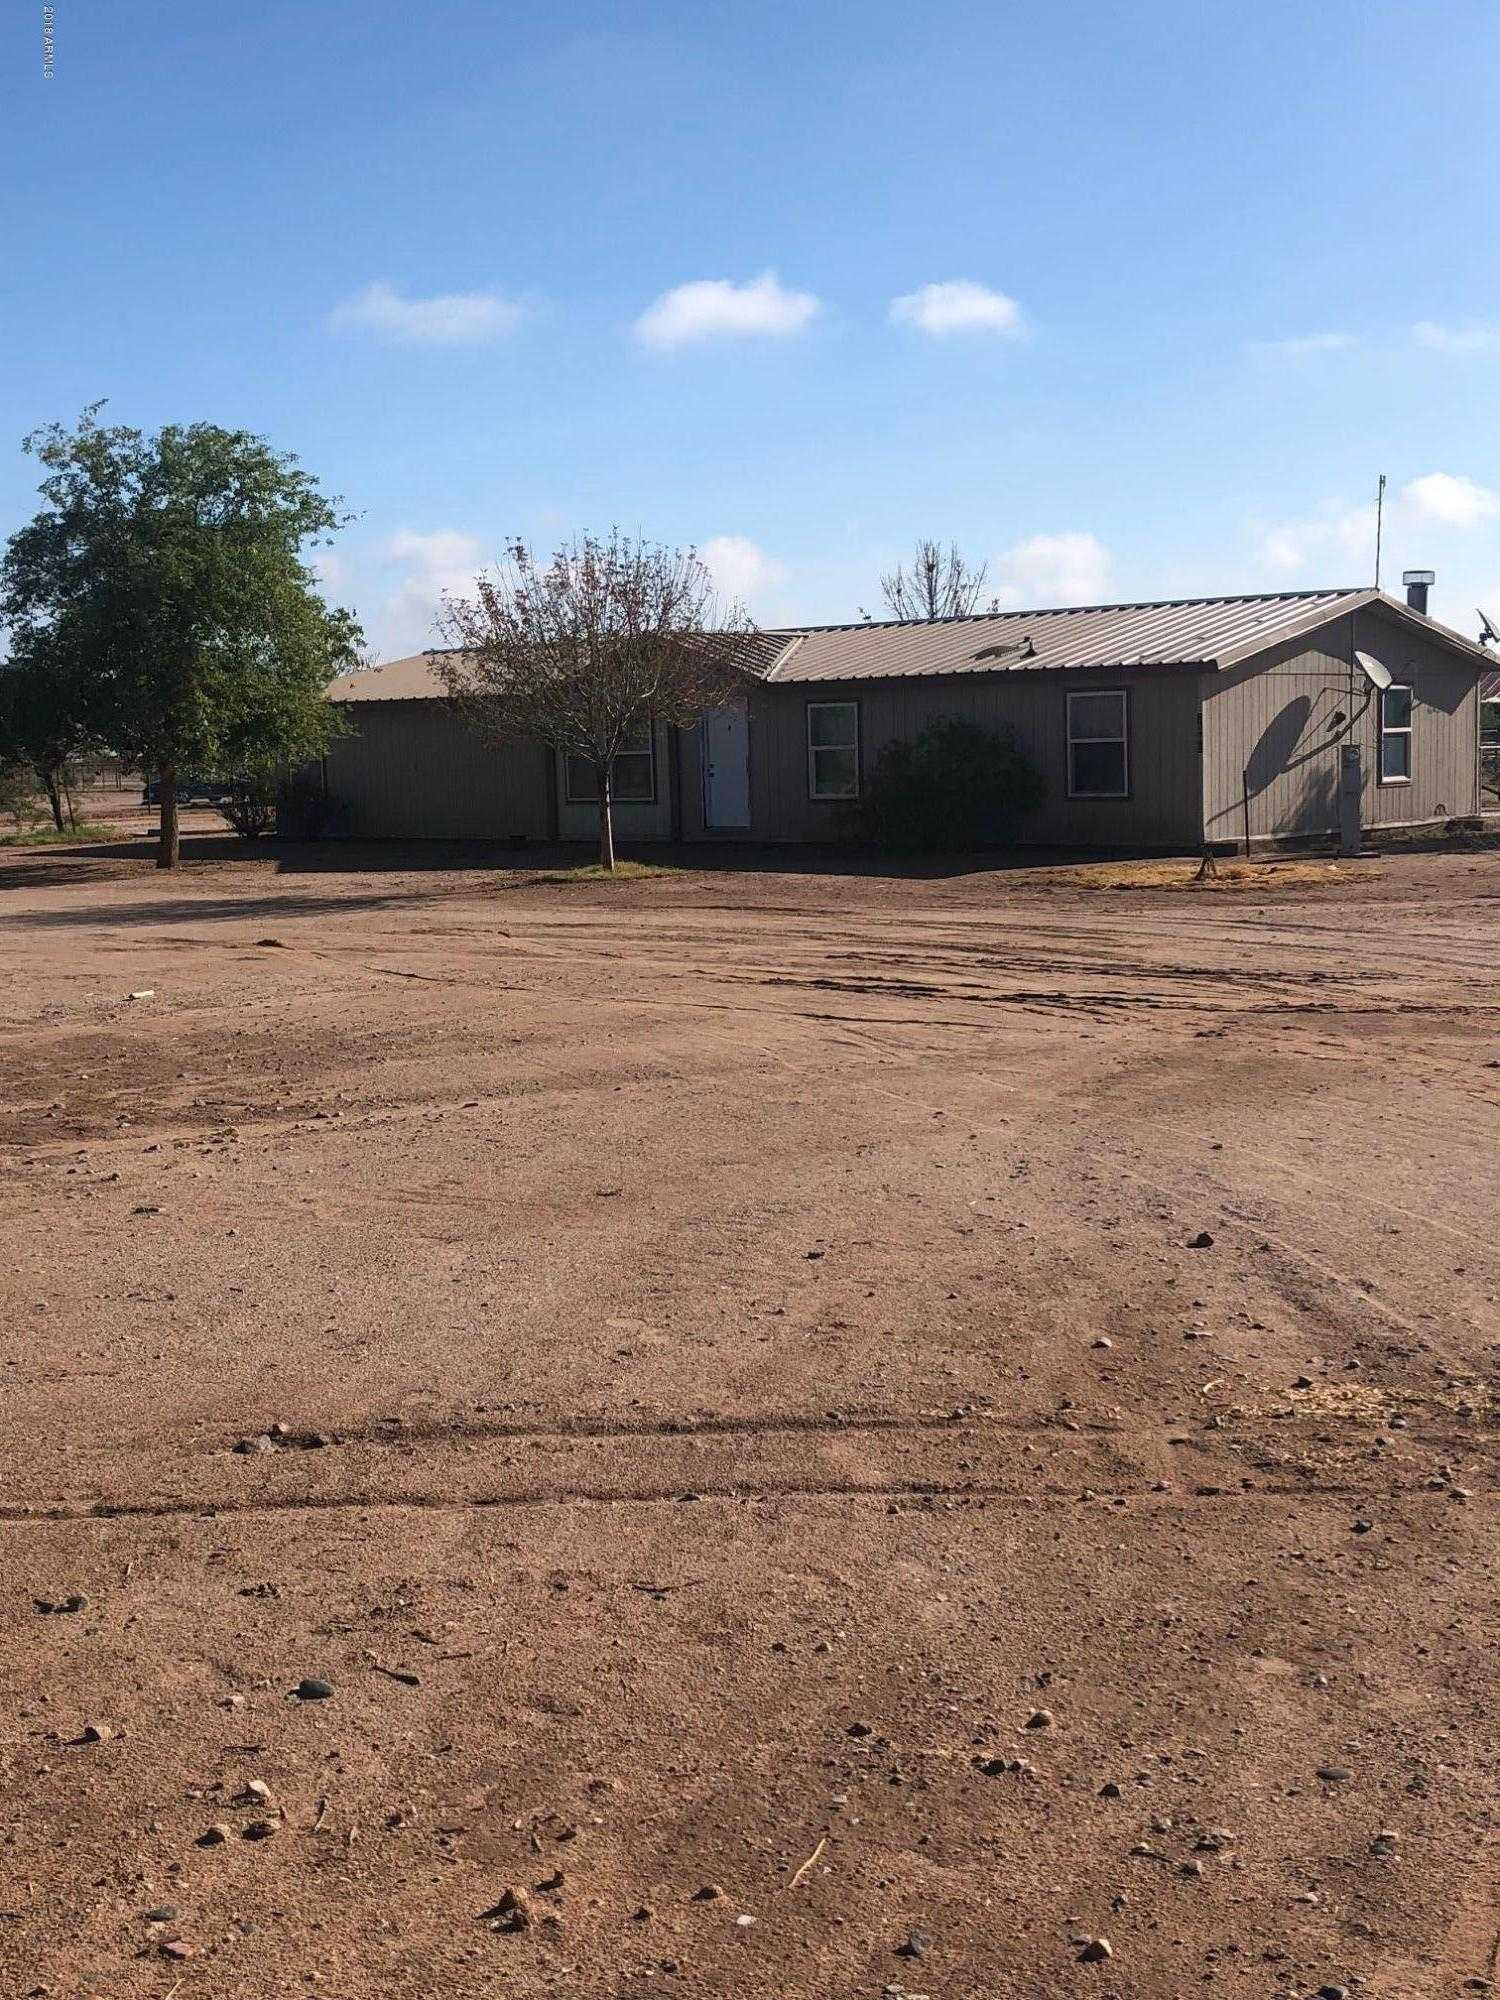 $200,000 - 3Br/2Ba - Home for Sale in S34 T5s R2e, Maricopa